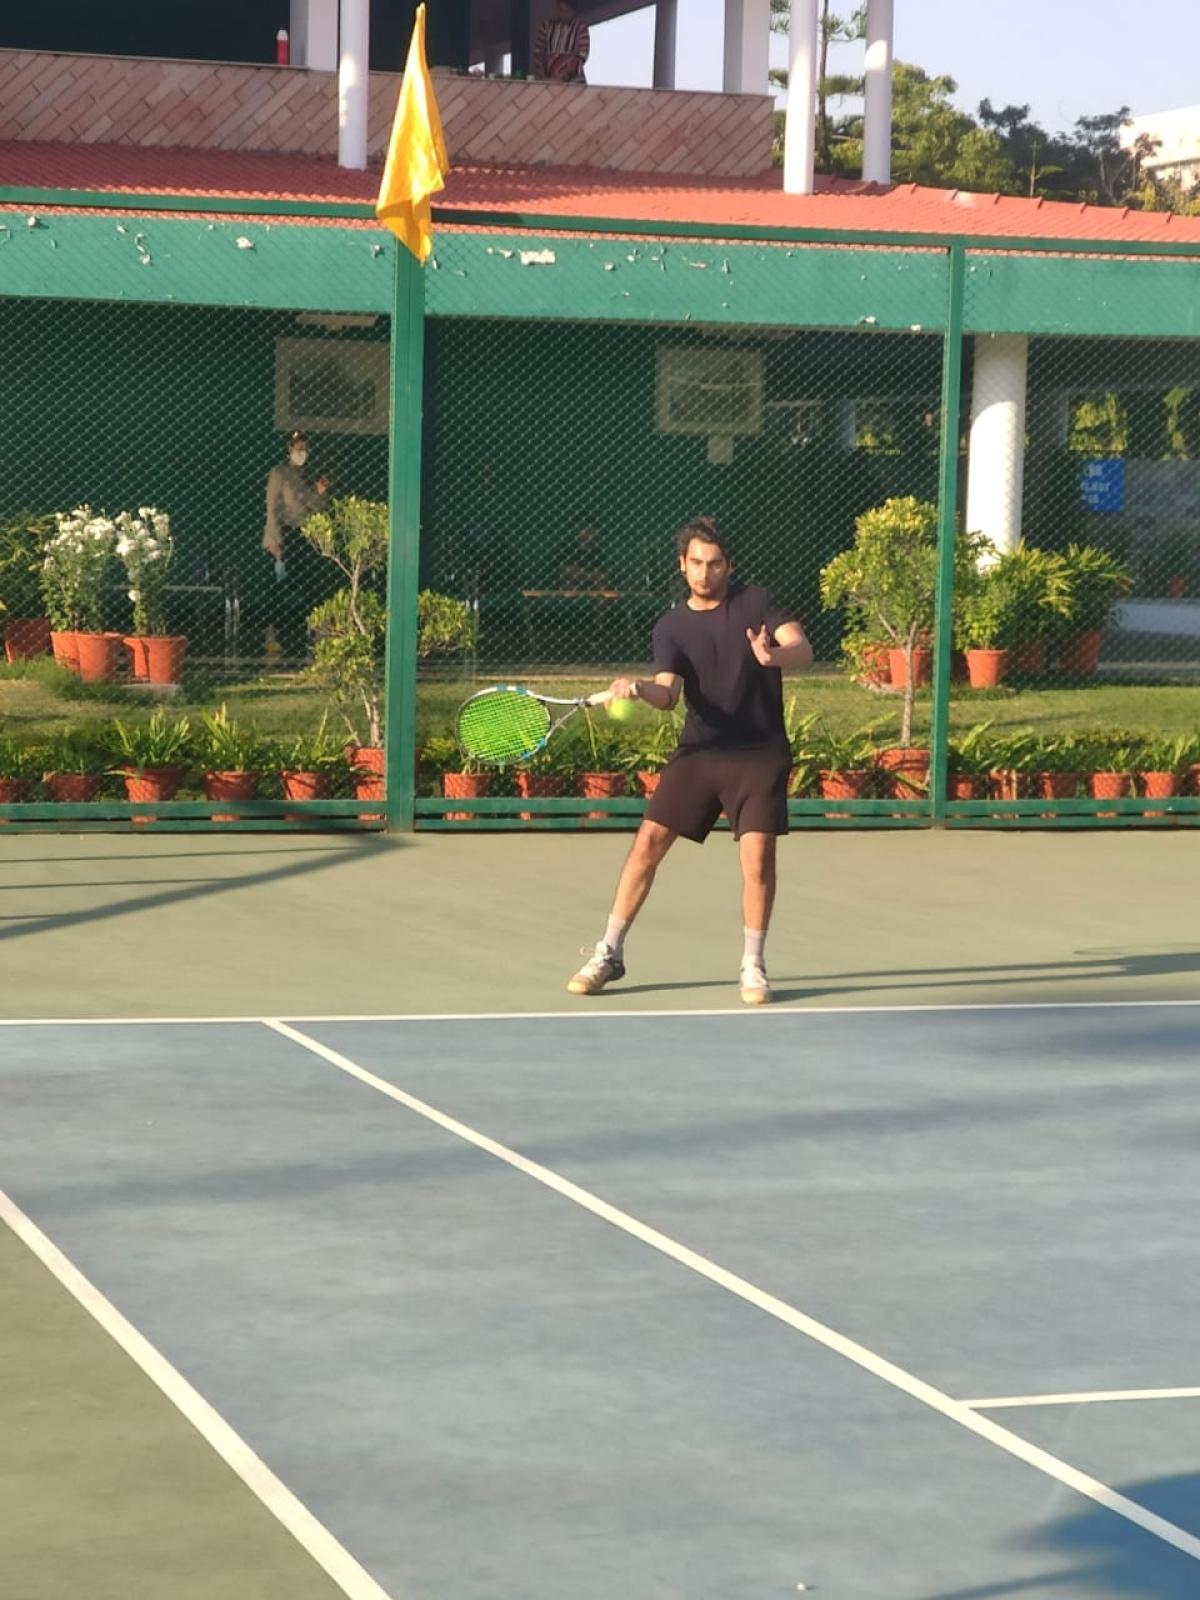 Indore: Abhiyansh, Shourya and Shikhar selected for main rounds of Puneet Agarwal Memorial tennis tournament